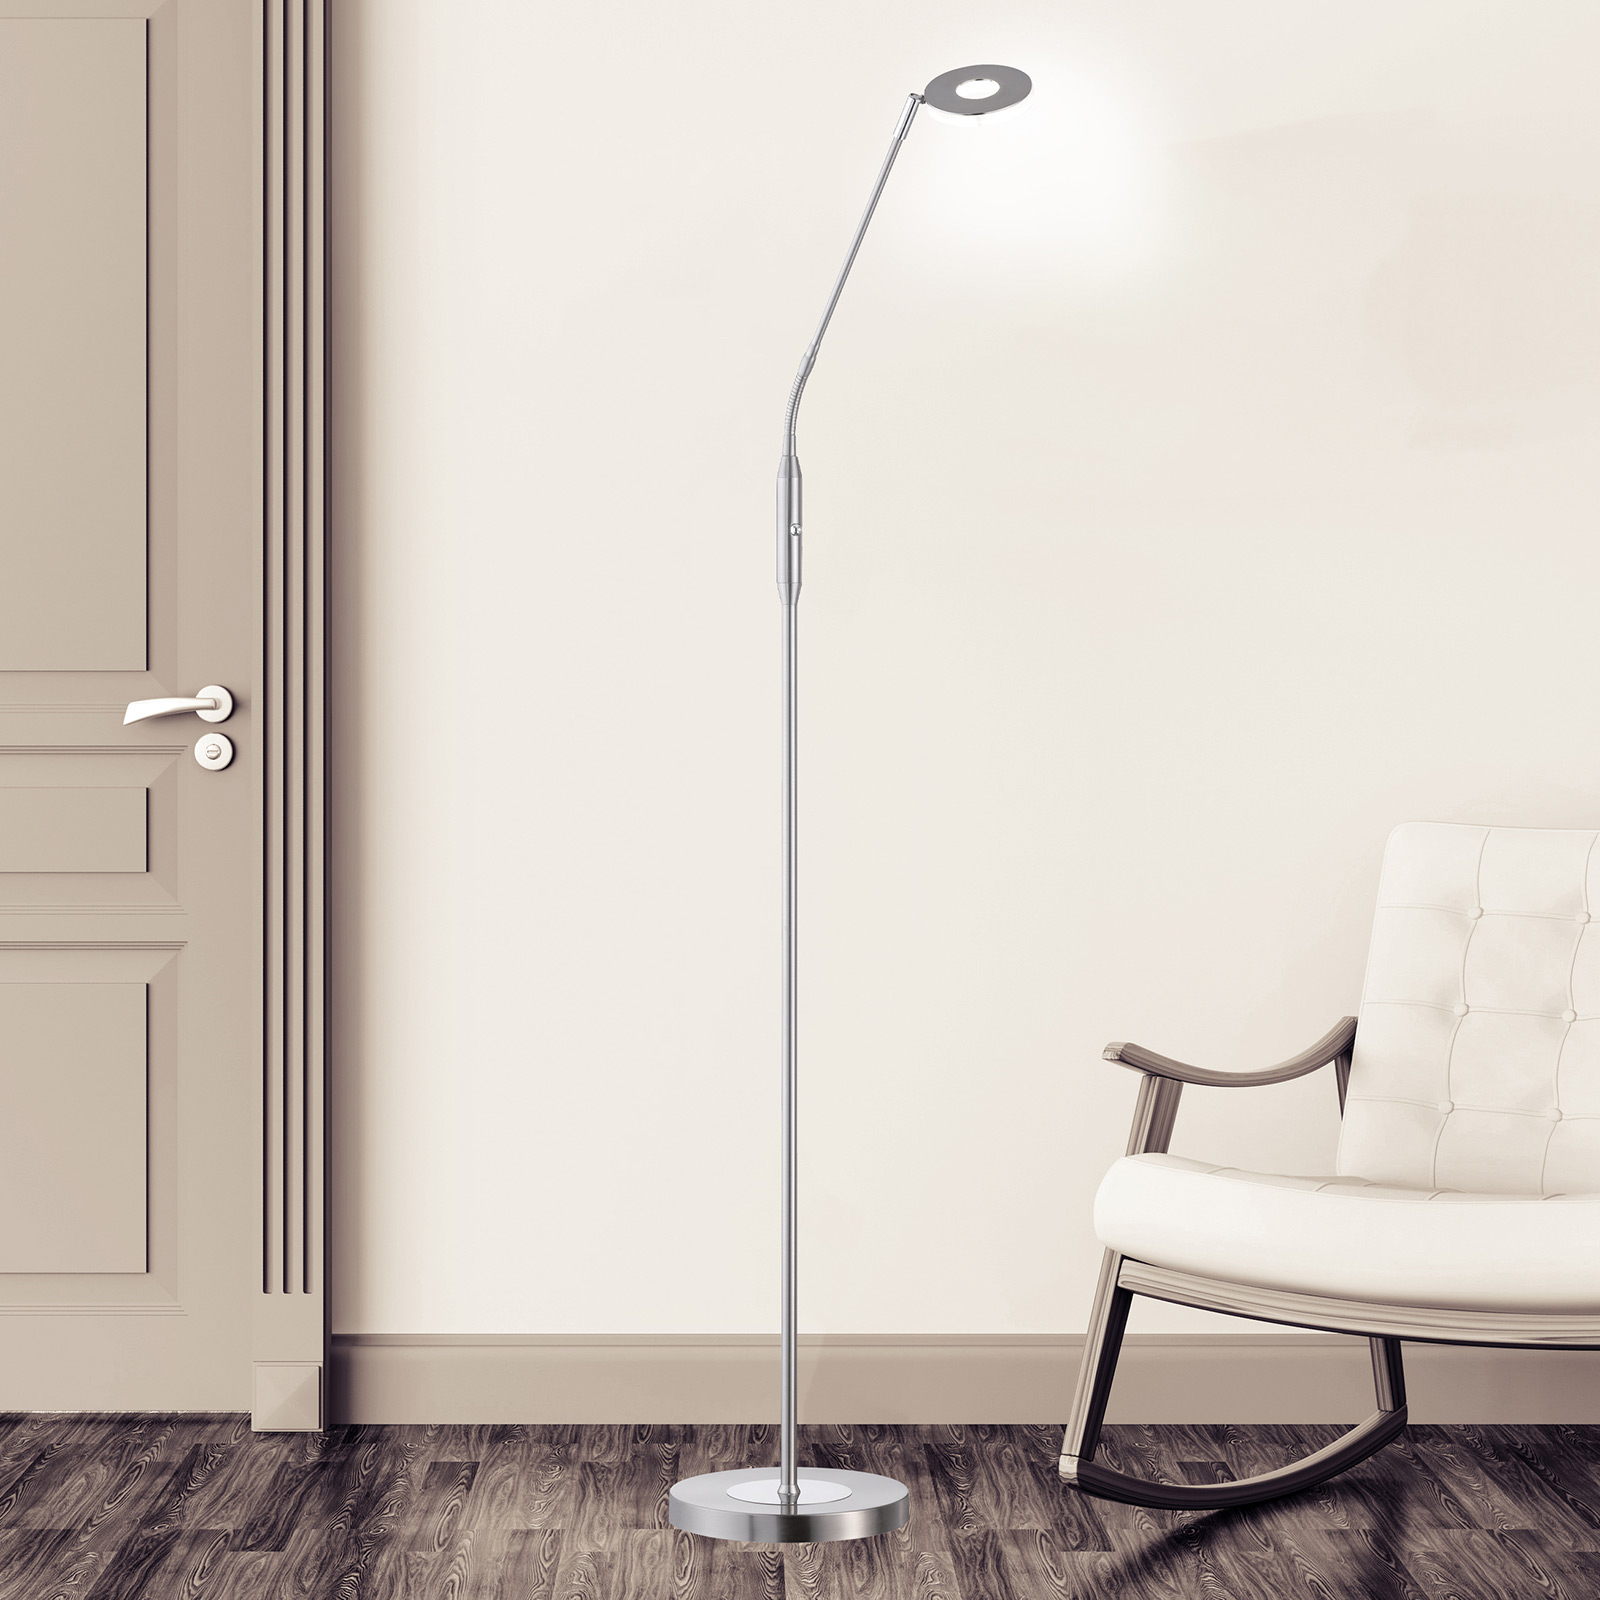 Acquista Piantana LED Dent, CCT, a 1 luce, nichel